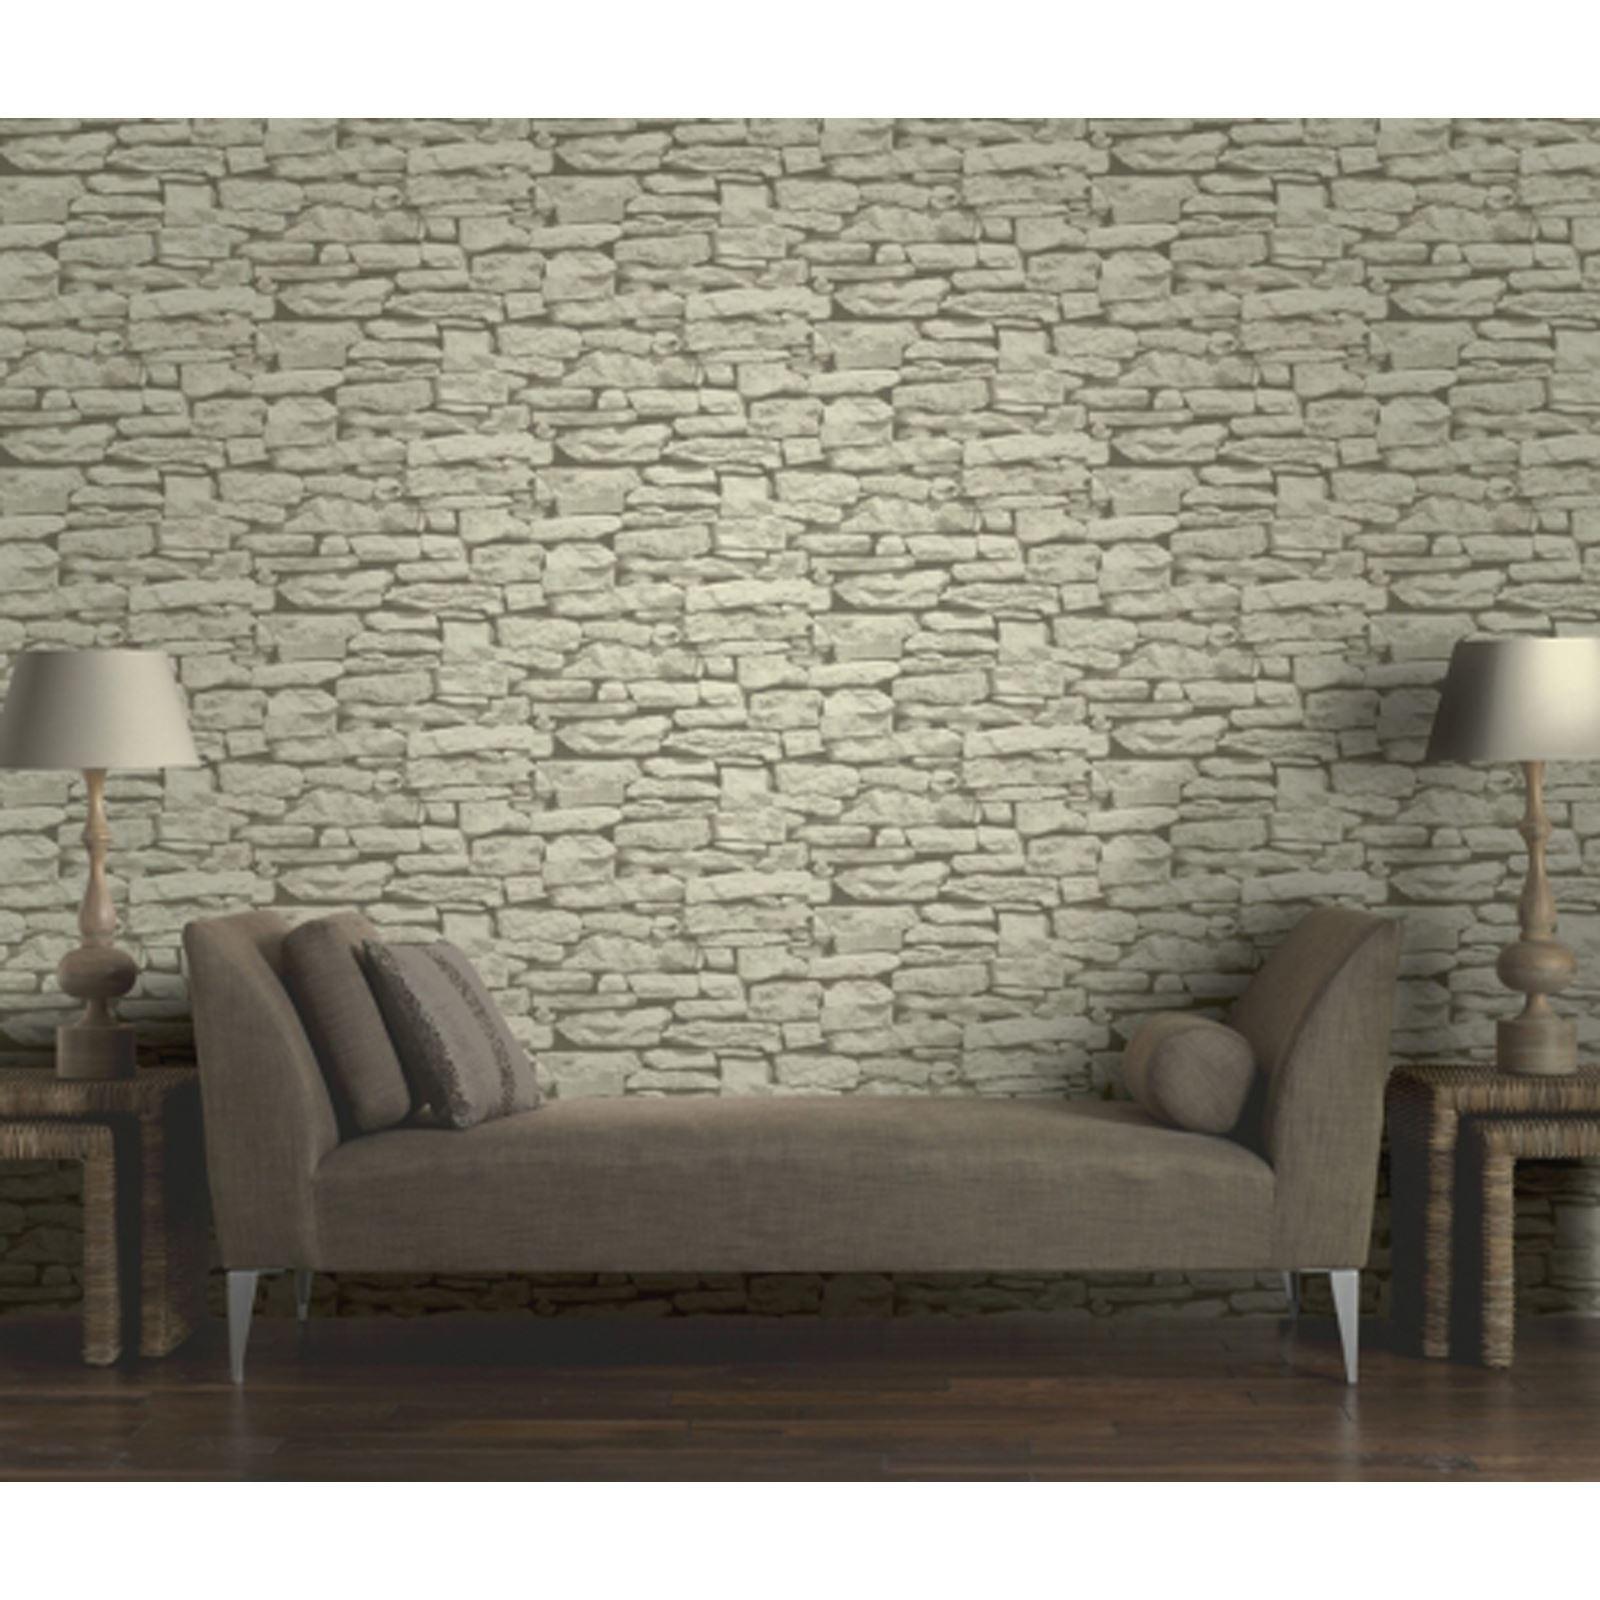 Arthouse Rustic Stone Effect Wallpaper Brick Morrocan